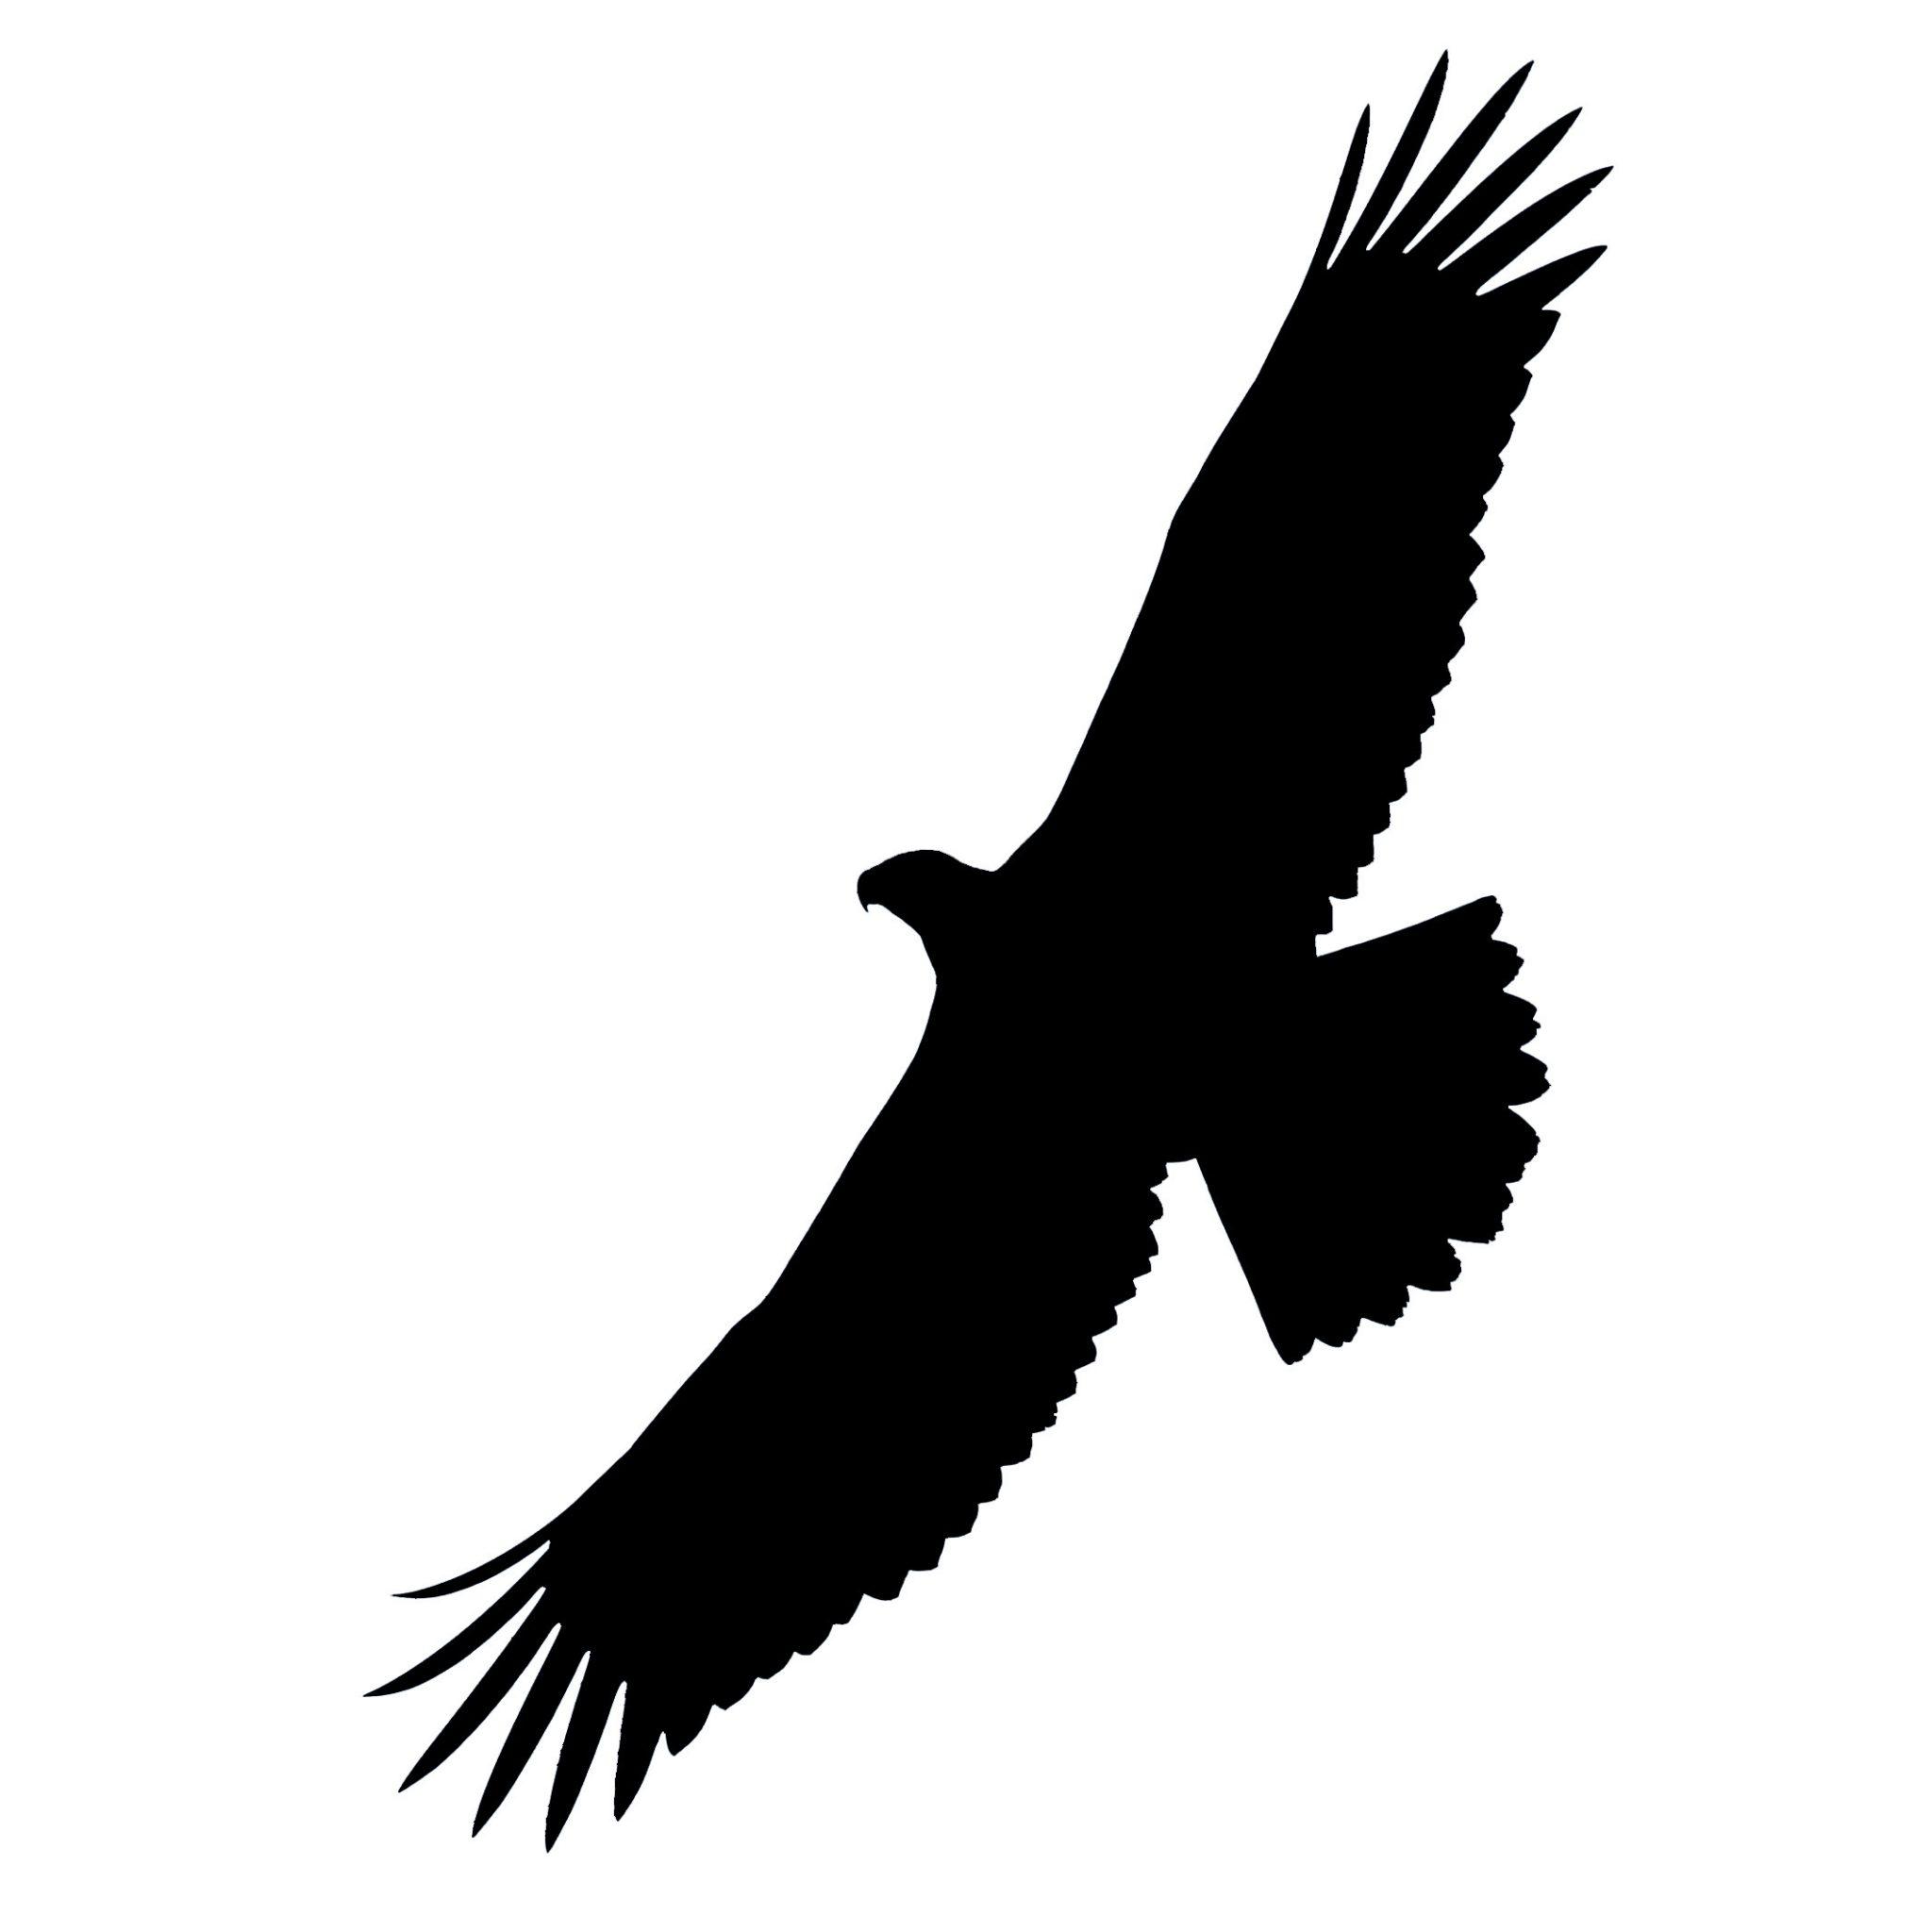 2048x2048 Bald Eagle Juvenile Flying Seneca Co, Ny 17jun12 Kjm 9704